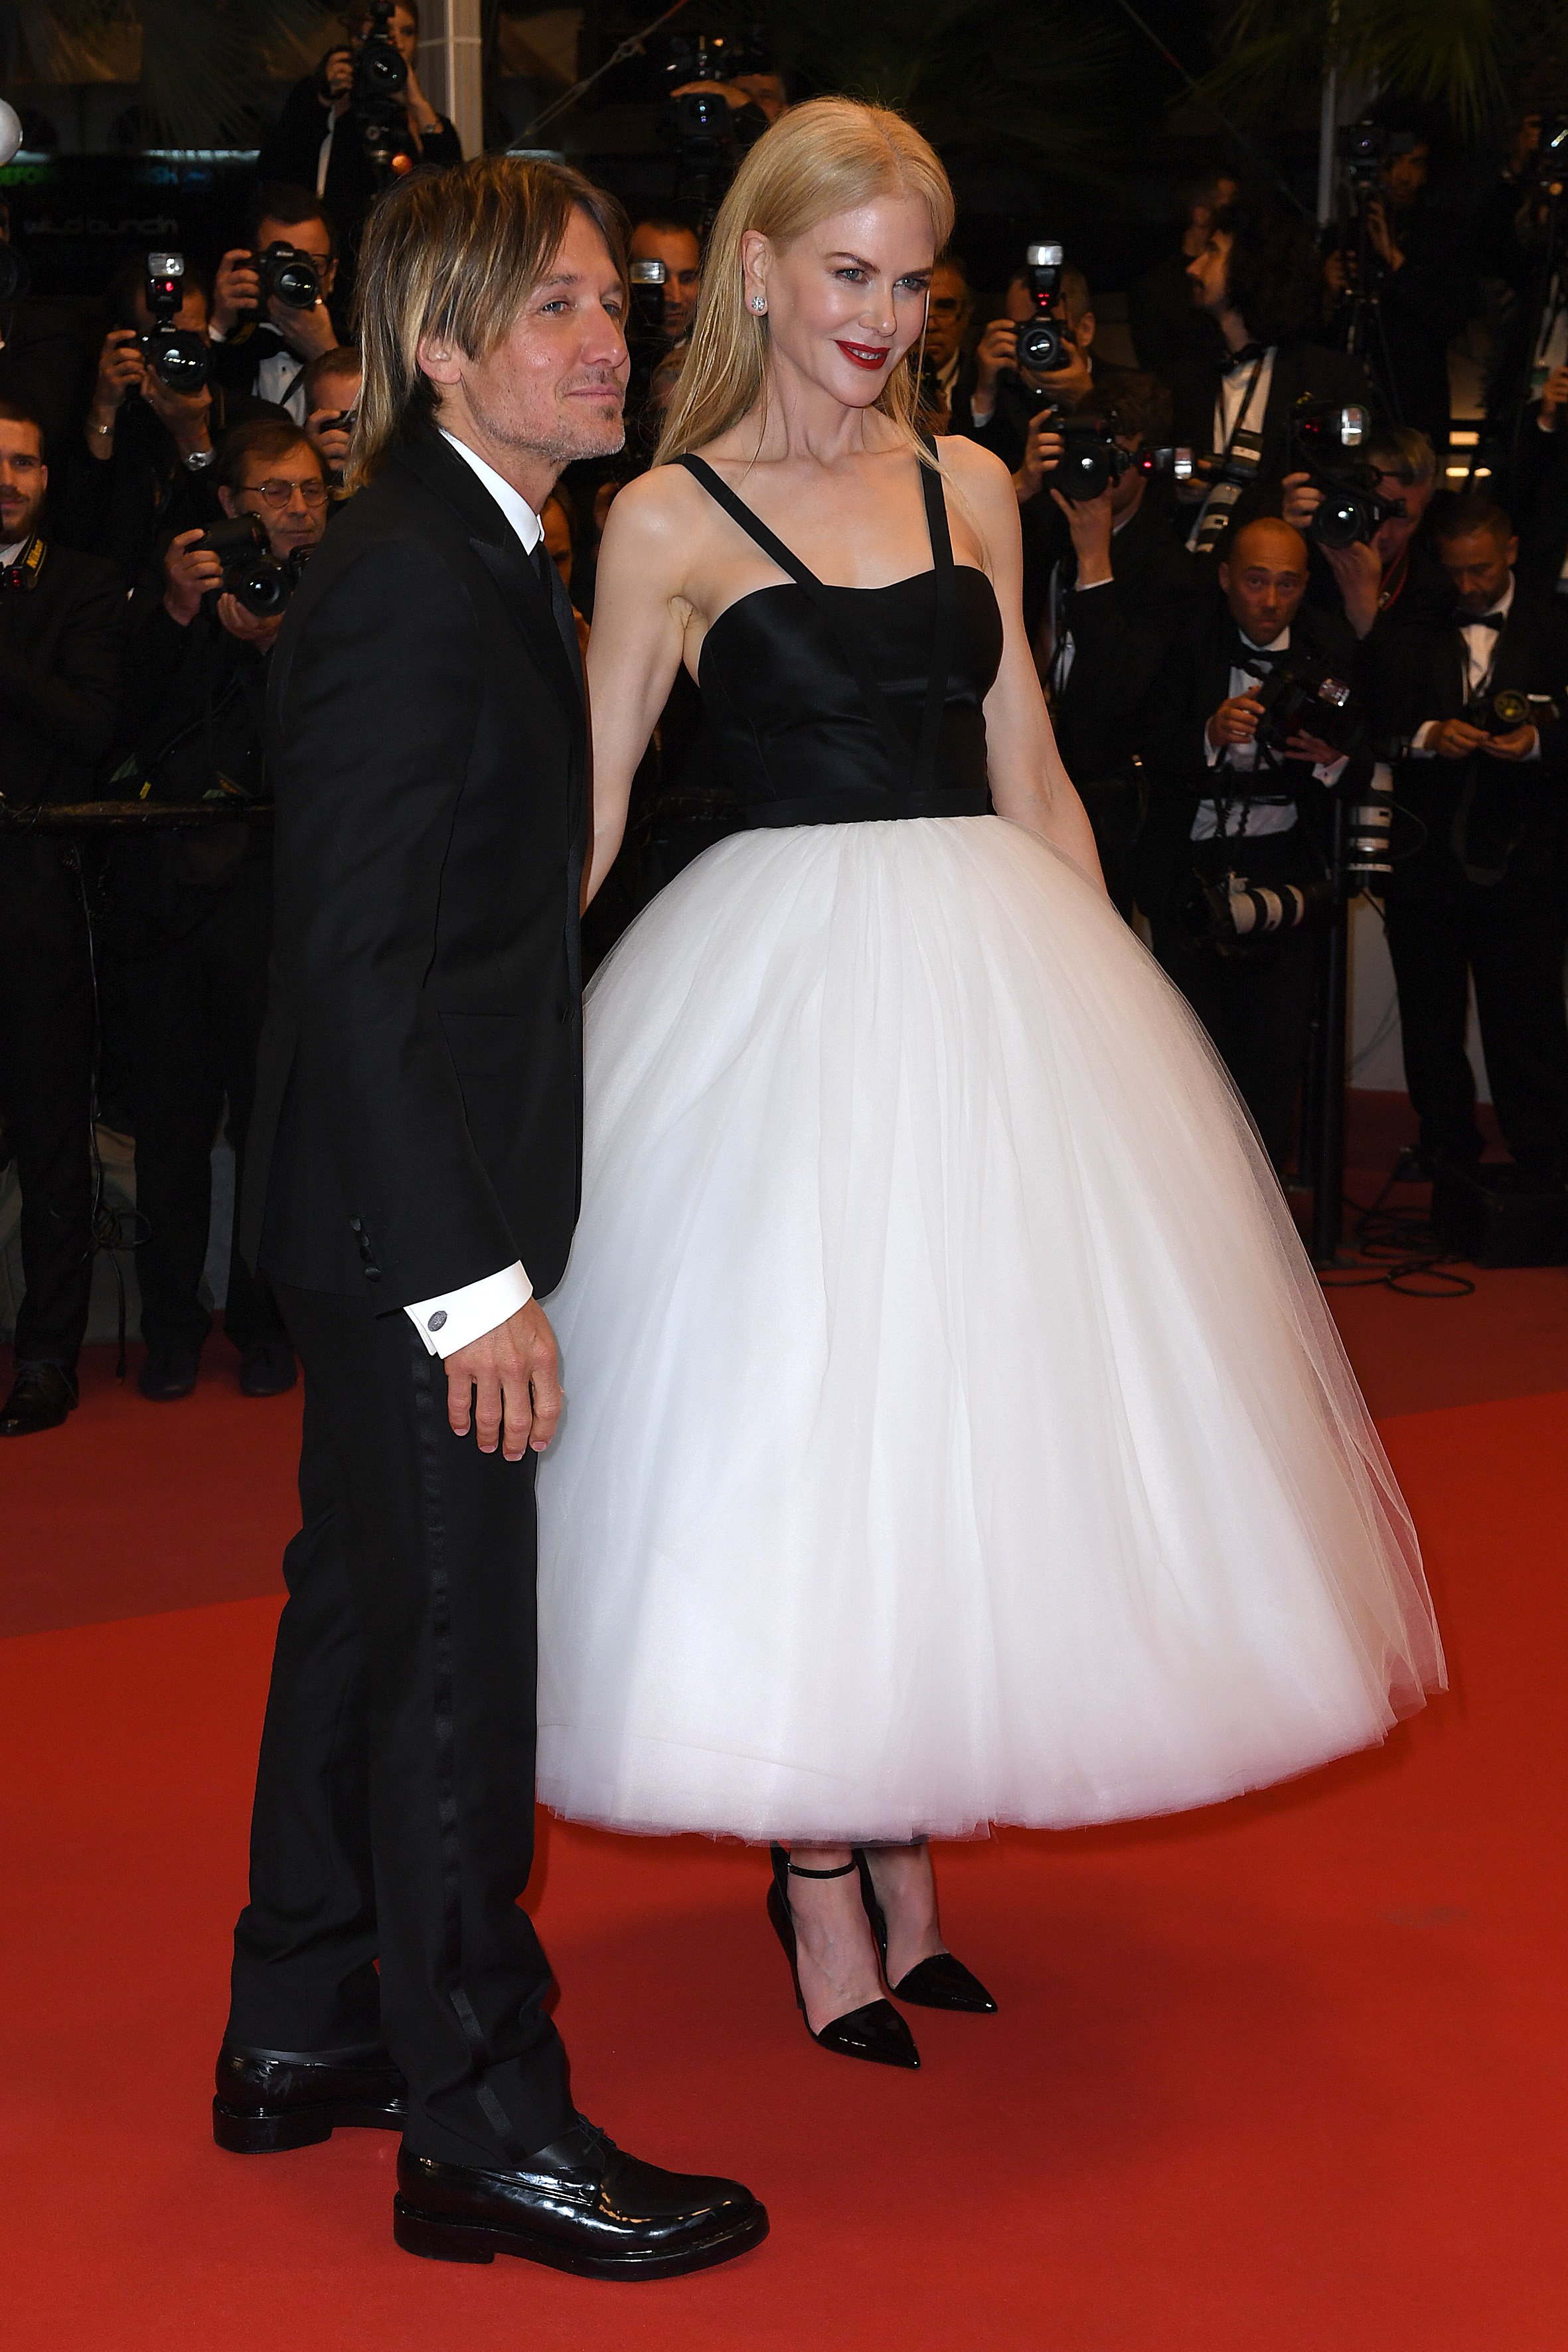 Cannes Nicole Kidman and husband Keith Urban at premiere in Cannes. <P> Pictured: Nicole Kidman and Keith Urban <B>Ref: SPL1505654  220517  </B><BR/> Picture by: Newspictures / Splash News<BR/> </P><P> <B>Splash News and Pictures</B><BR/> Los Angeles:310-821-2666<BR/> New York:212-619-2666<BR/> London:870-934-2666<BR/> <span id=